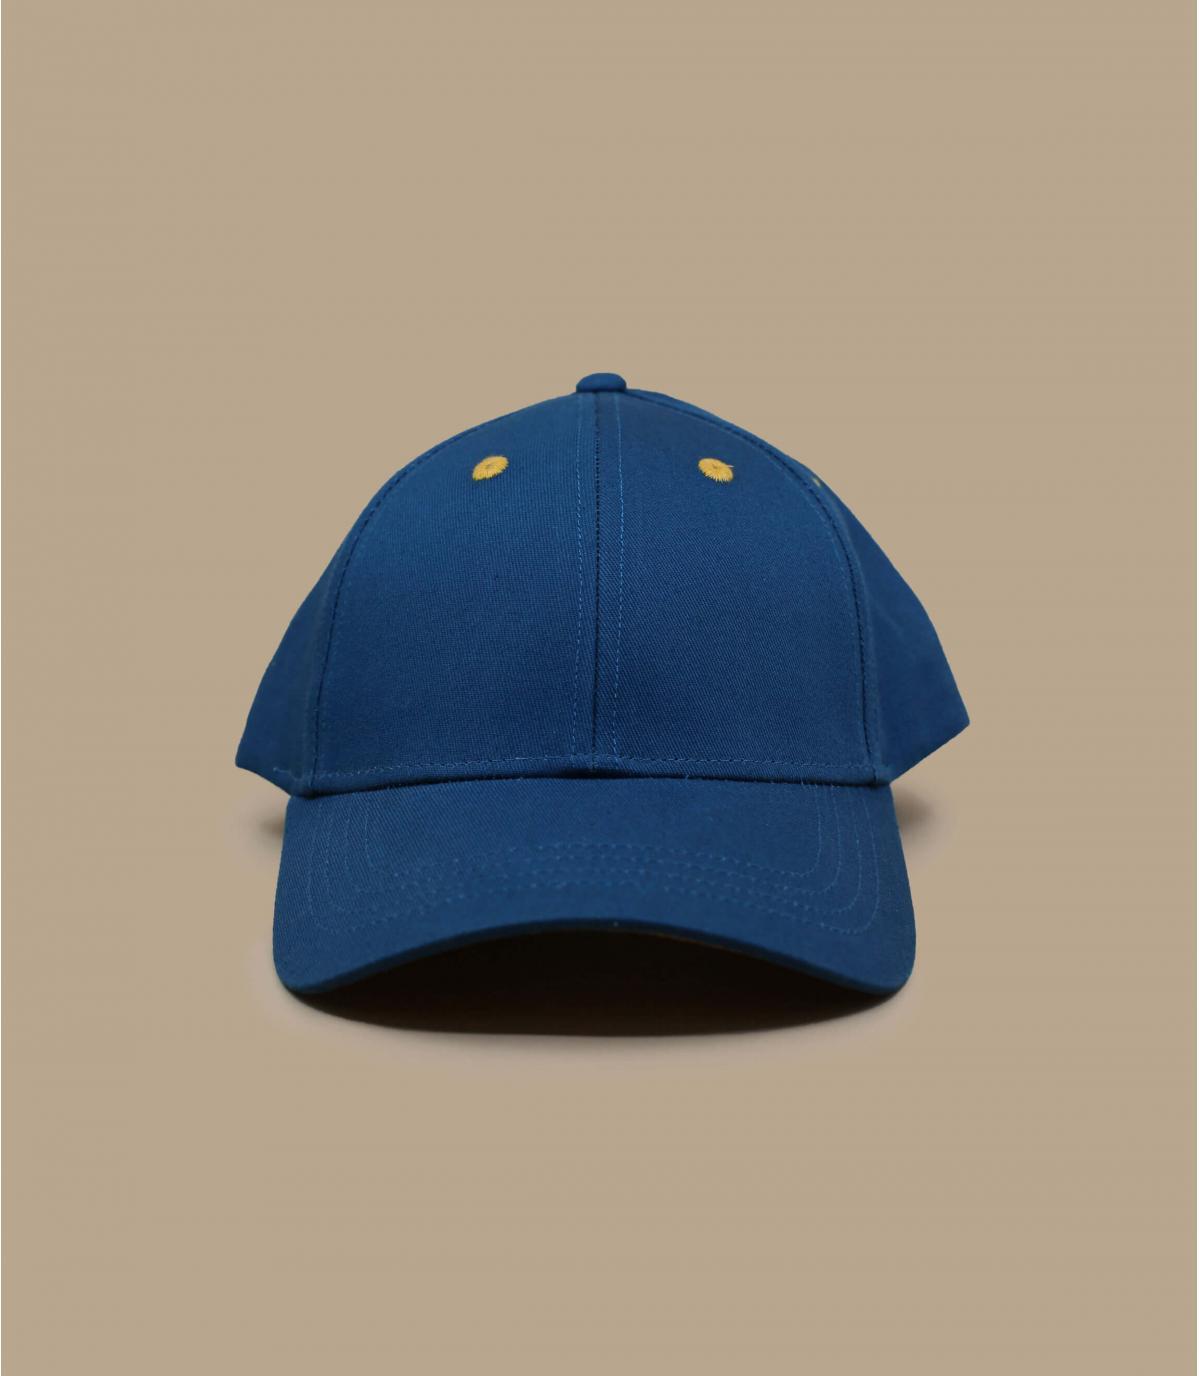 Blue Enfant Terrible adult cap